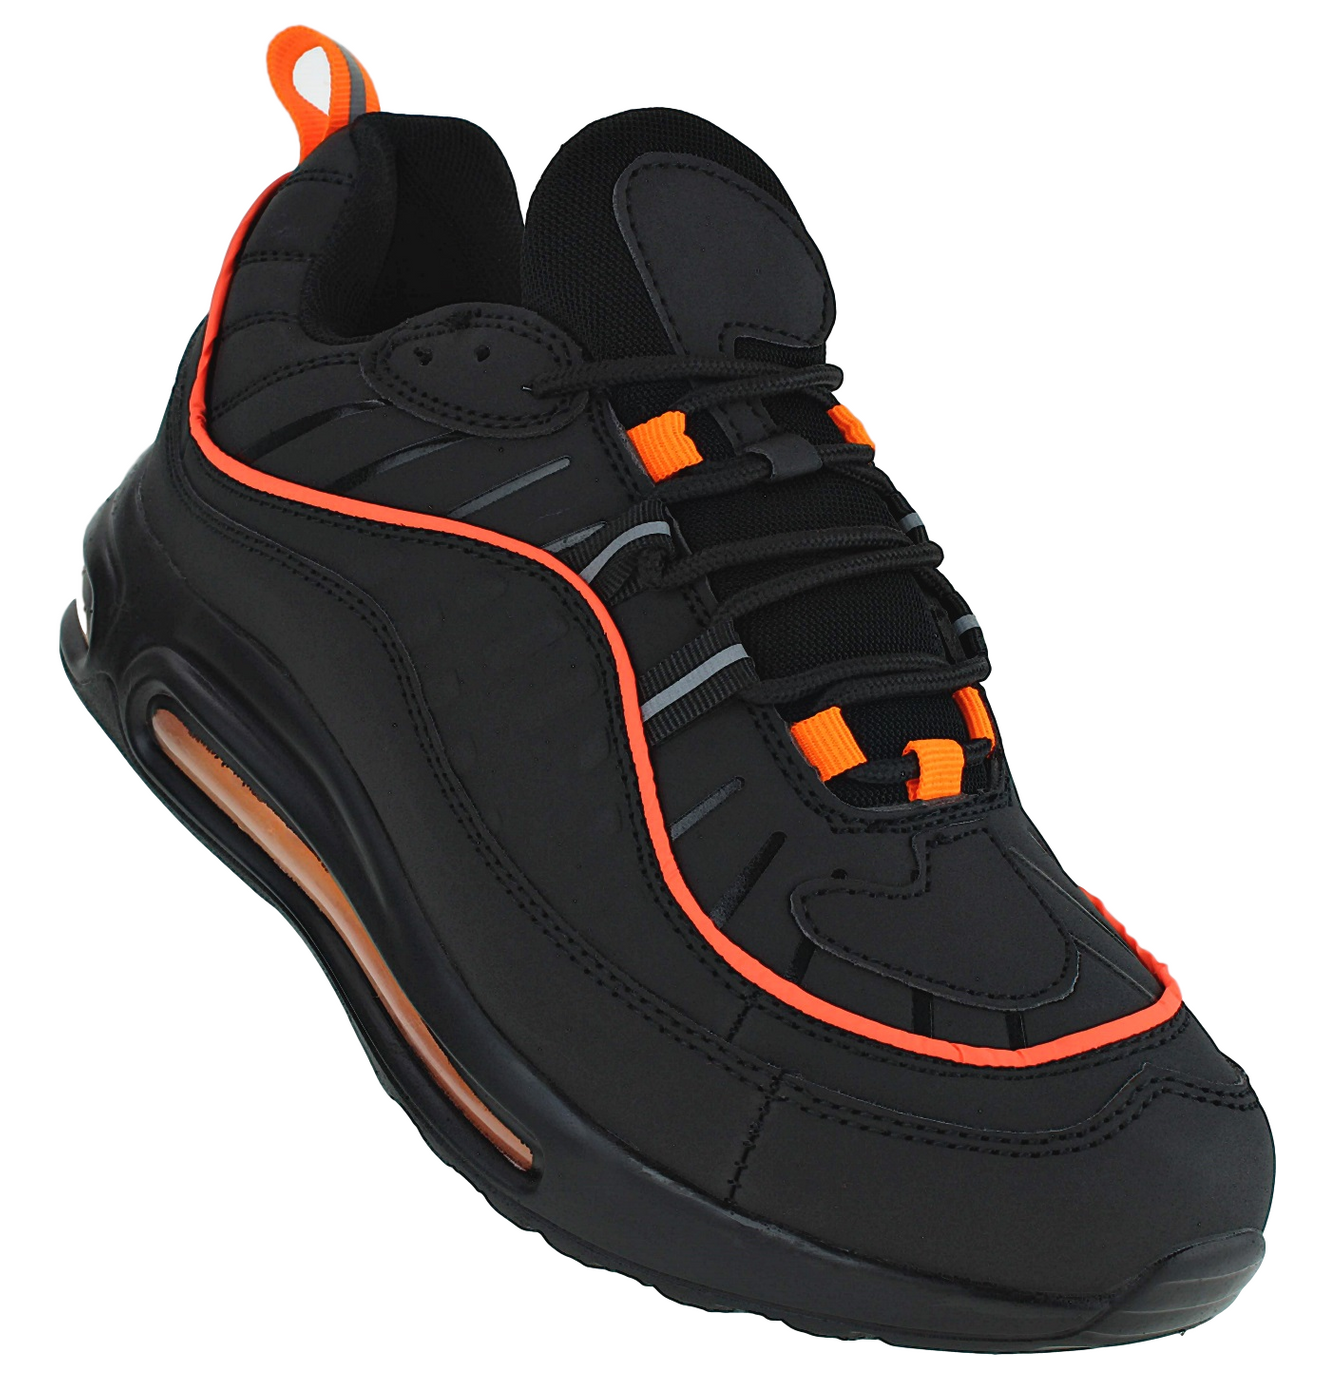 Neon Turnschuhe Schuhe Sneaker Sportschuhe Luftpolstersohle Damen Herren 068